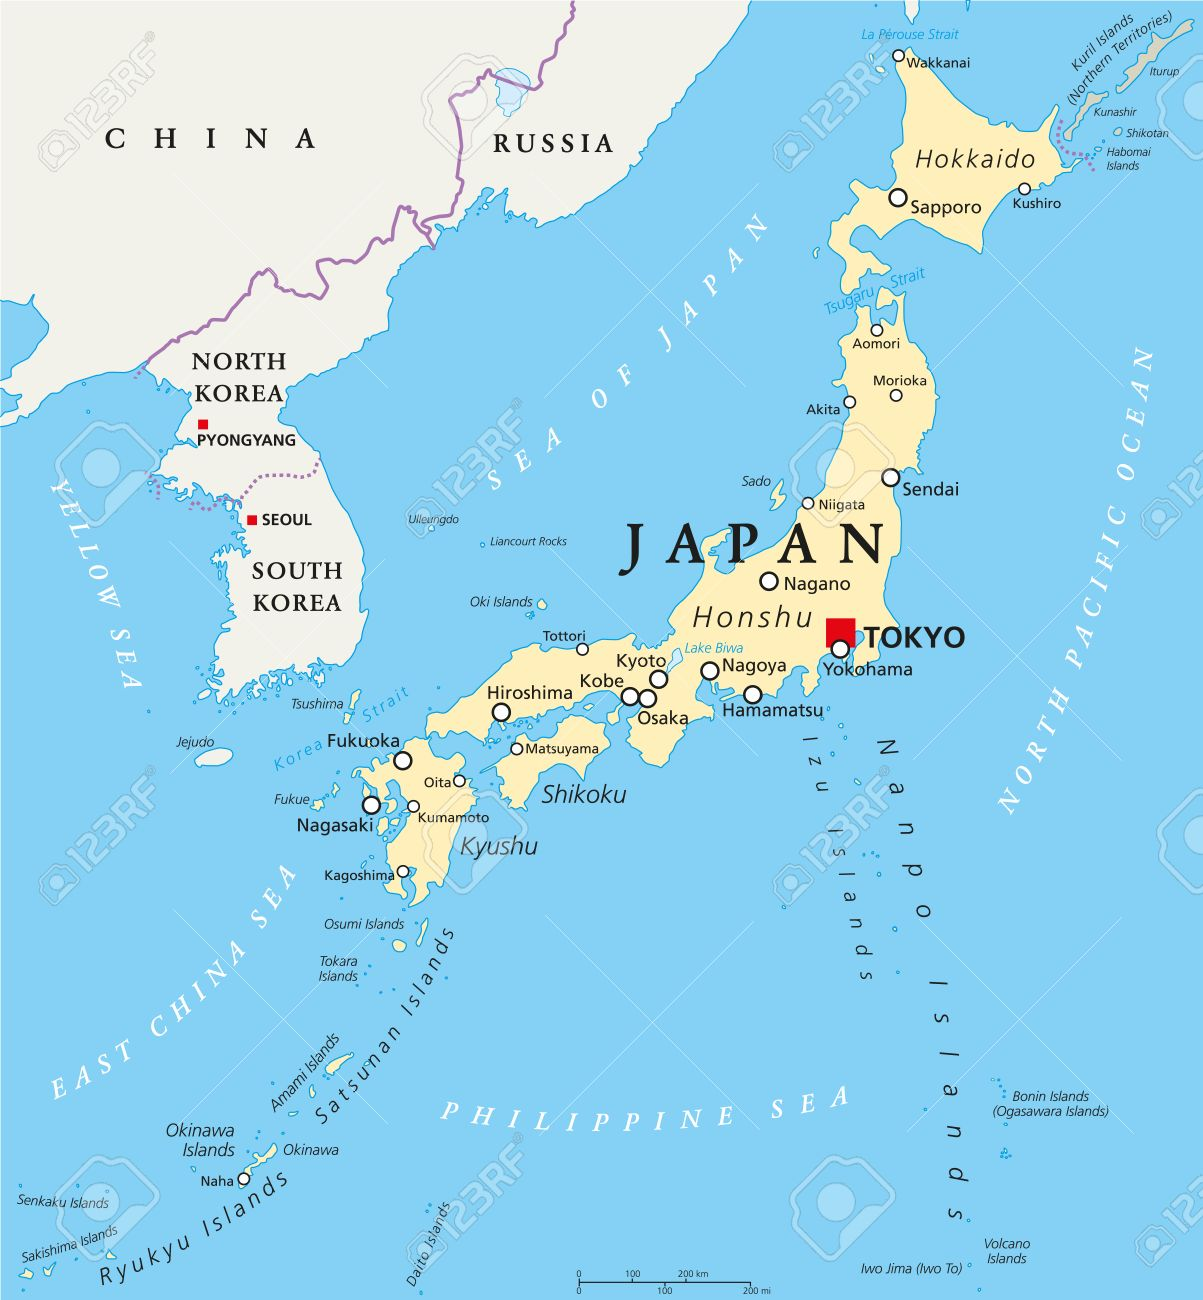 Yokohama Stock Vector Illustration And Royalty Free Yokohama - Japan map yokohama tokyo